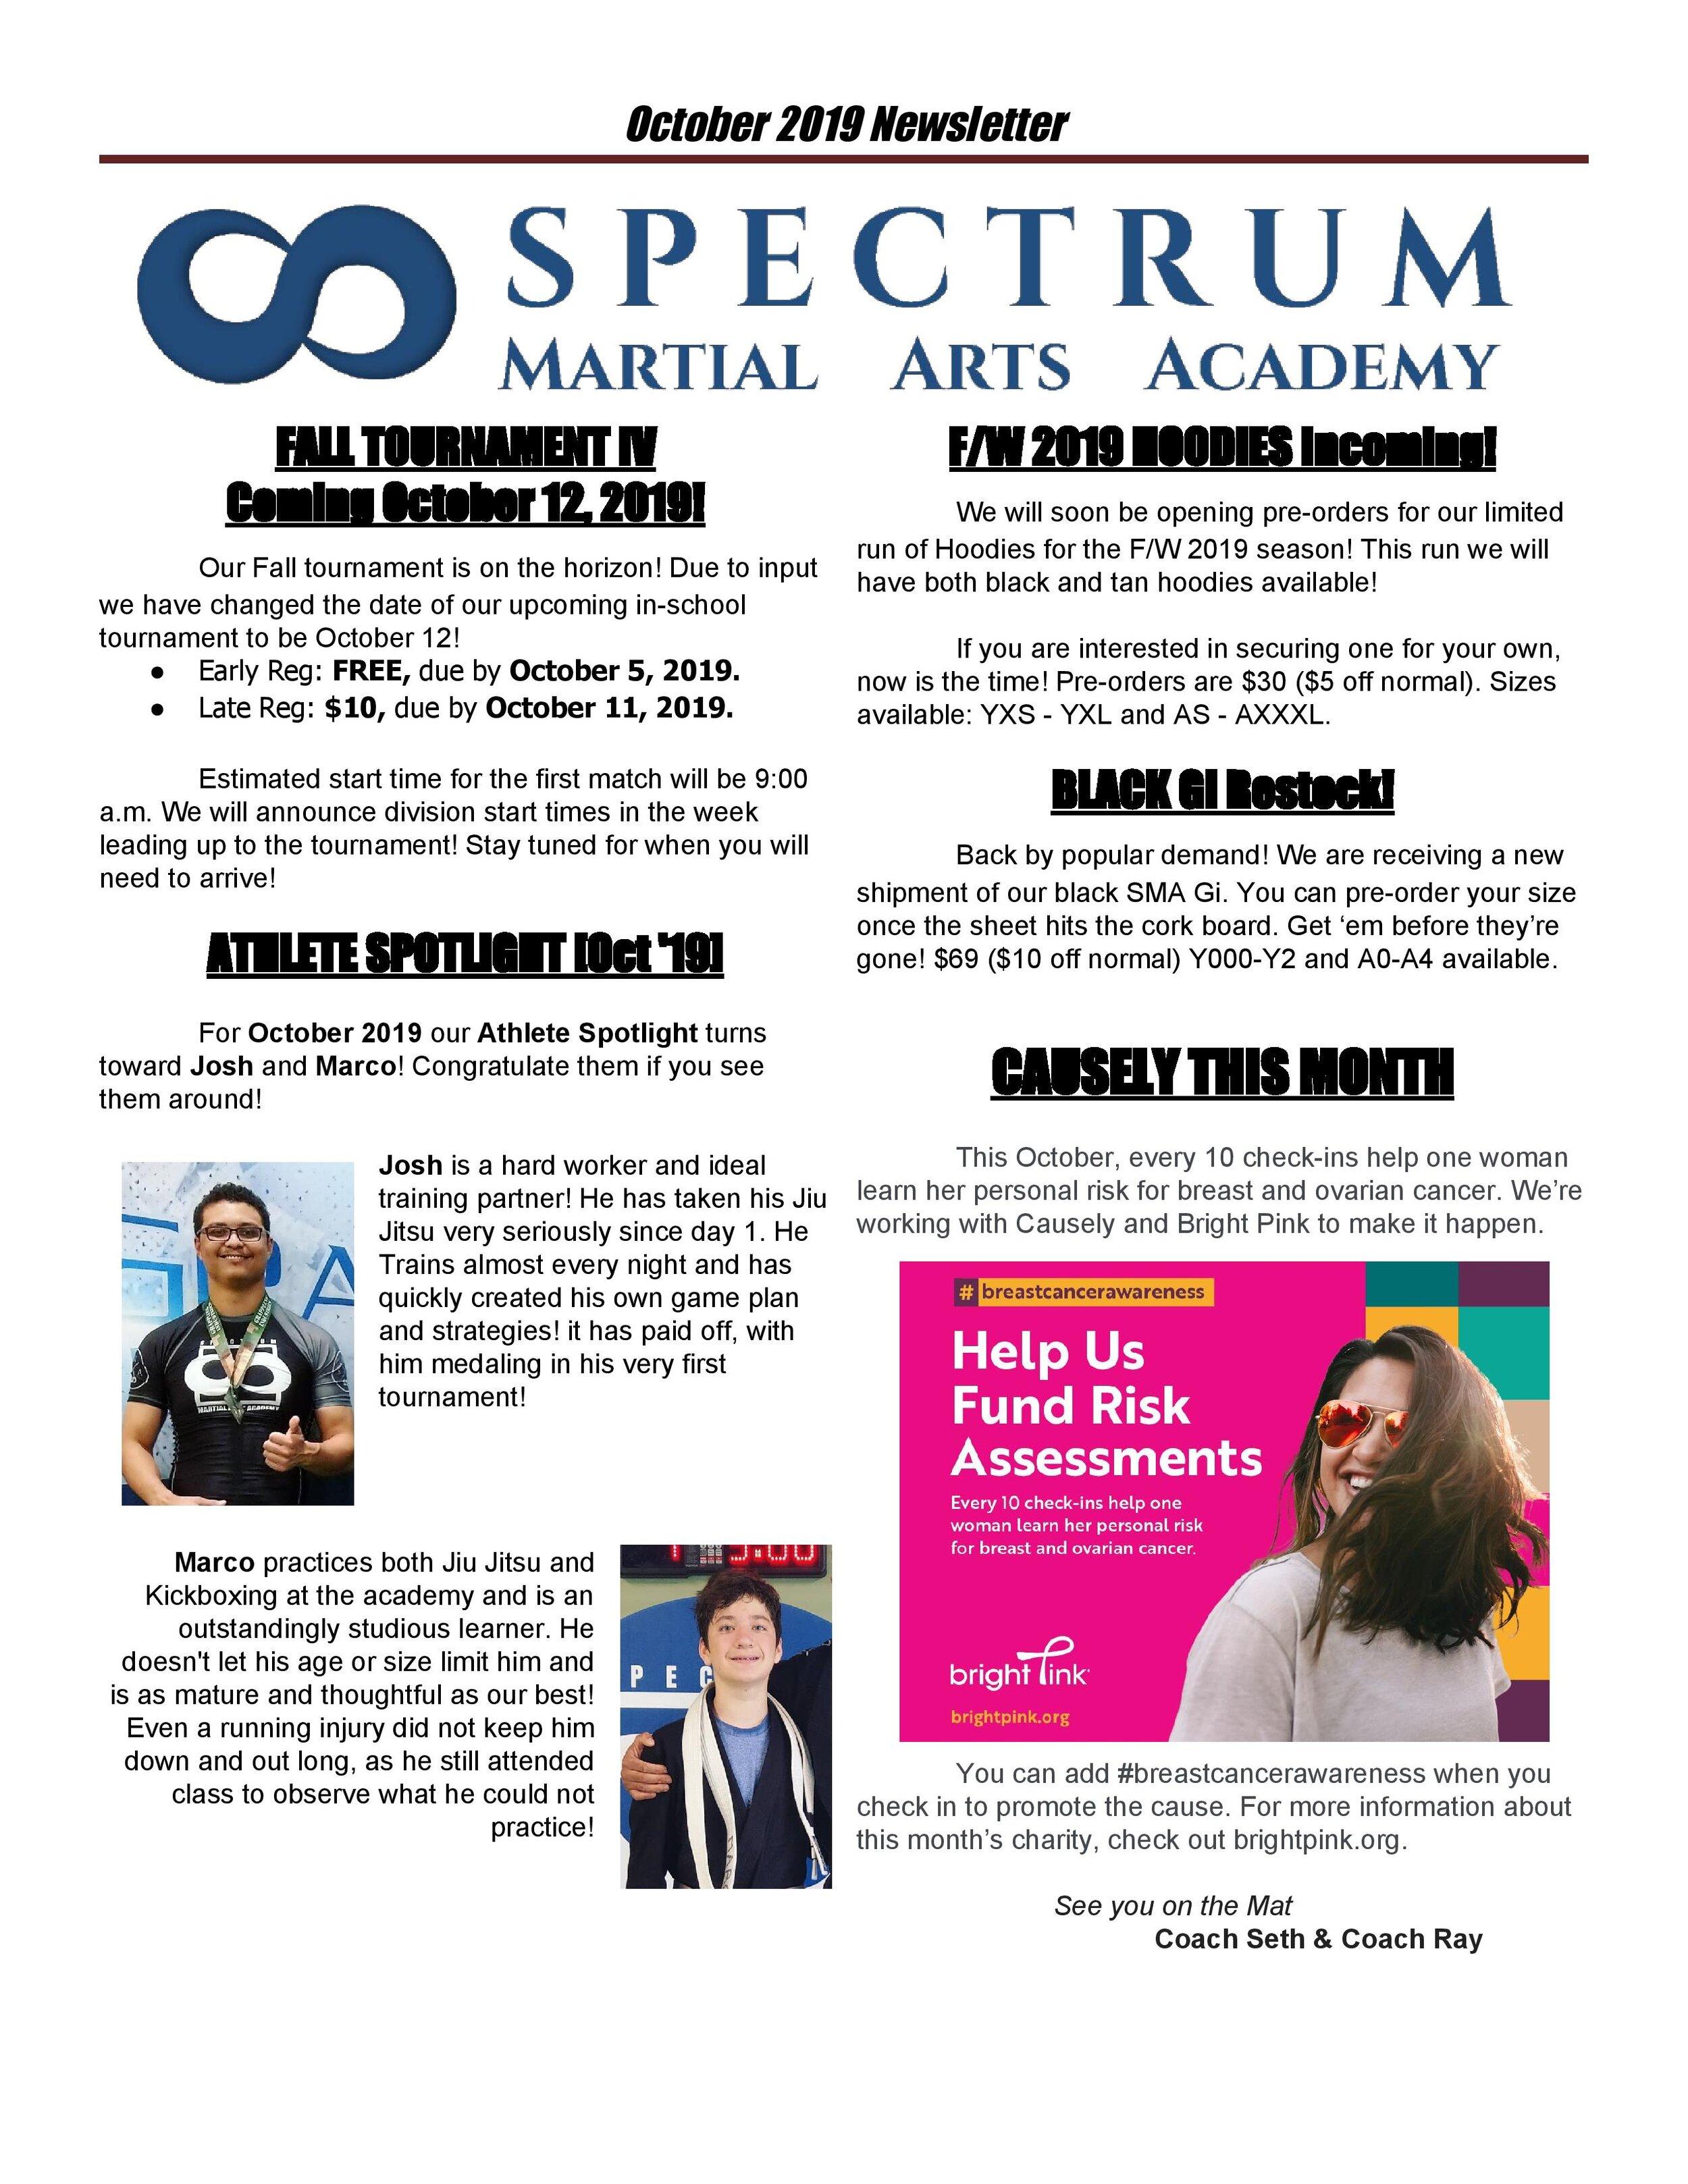 October 2019 Newsletter-page-001.jpg